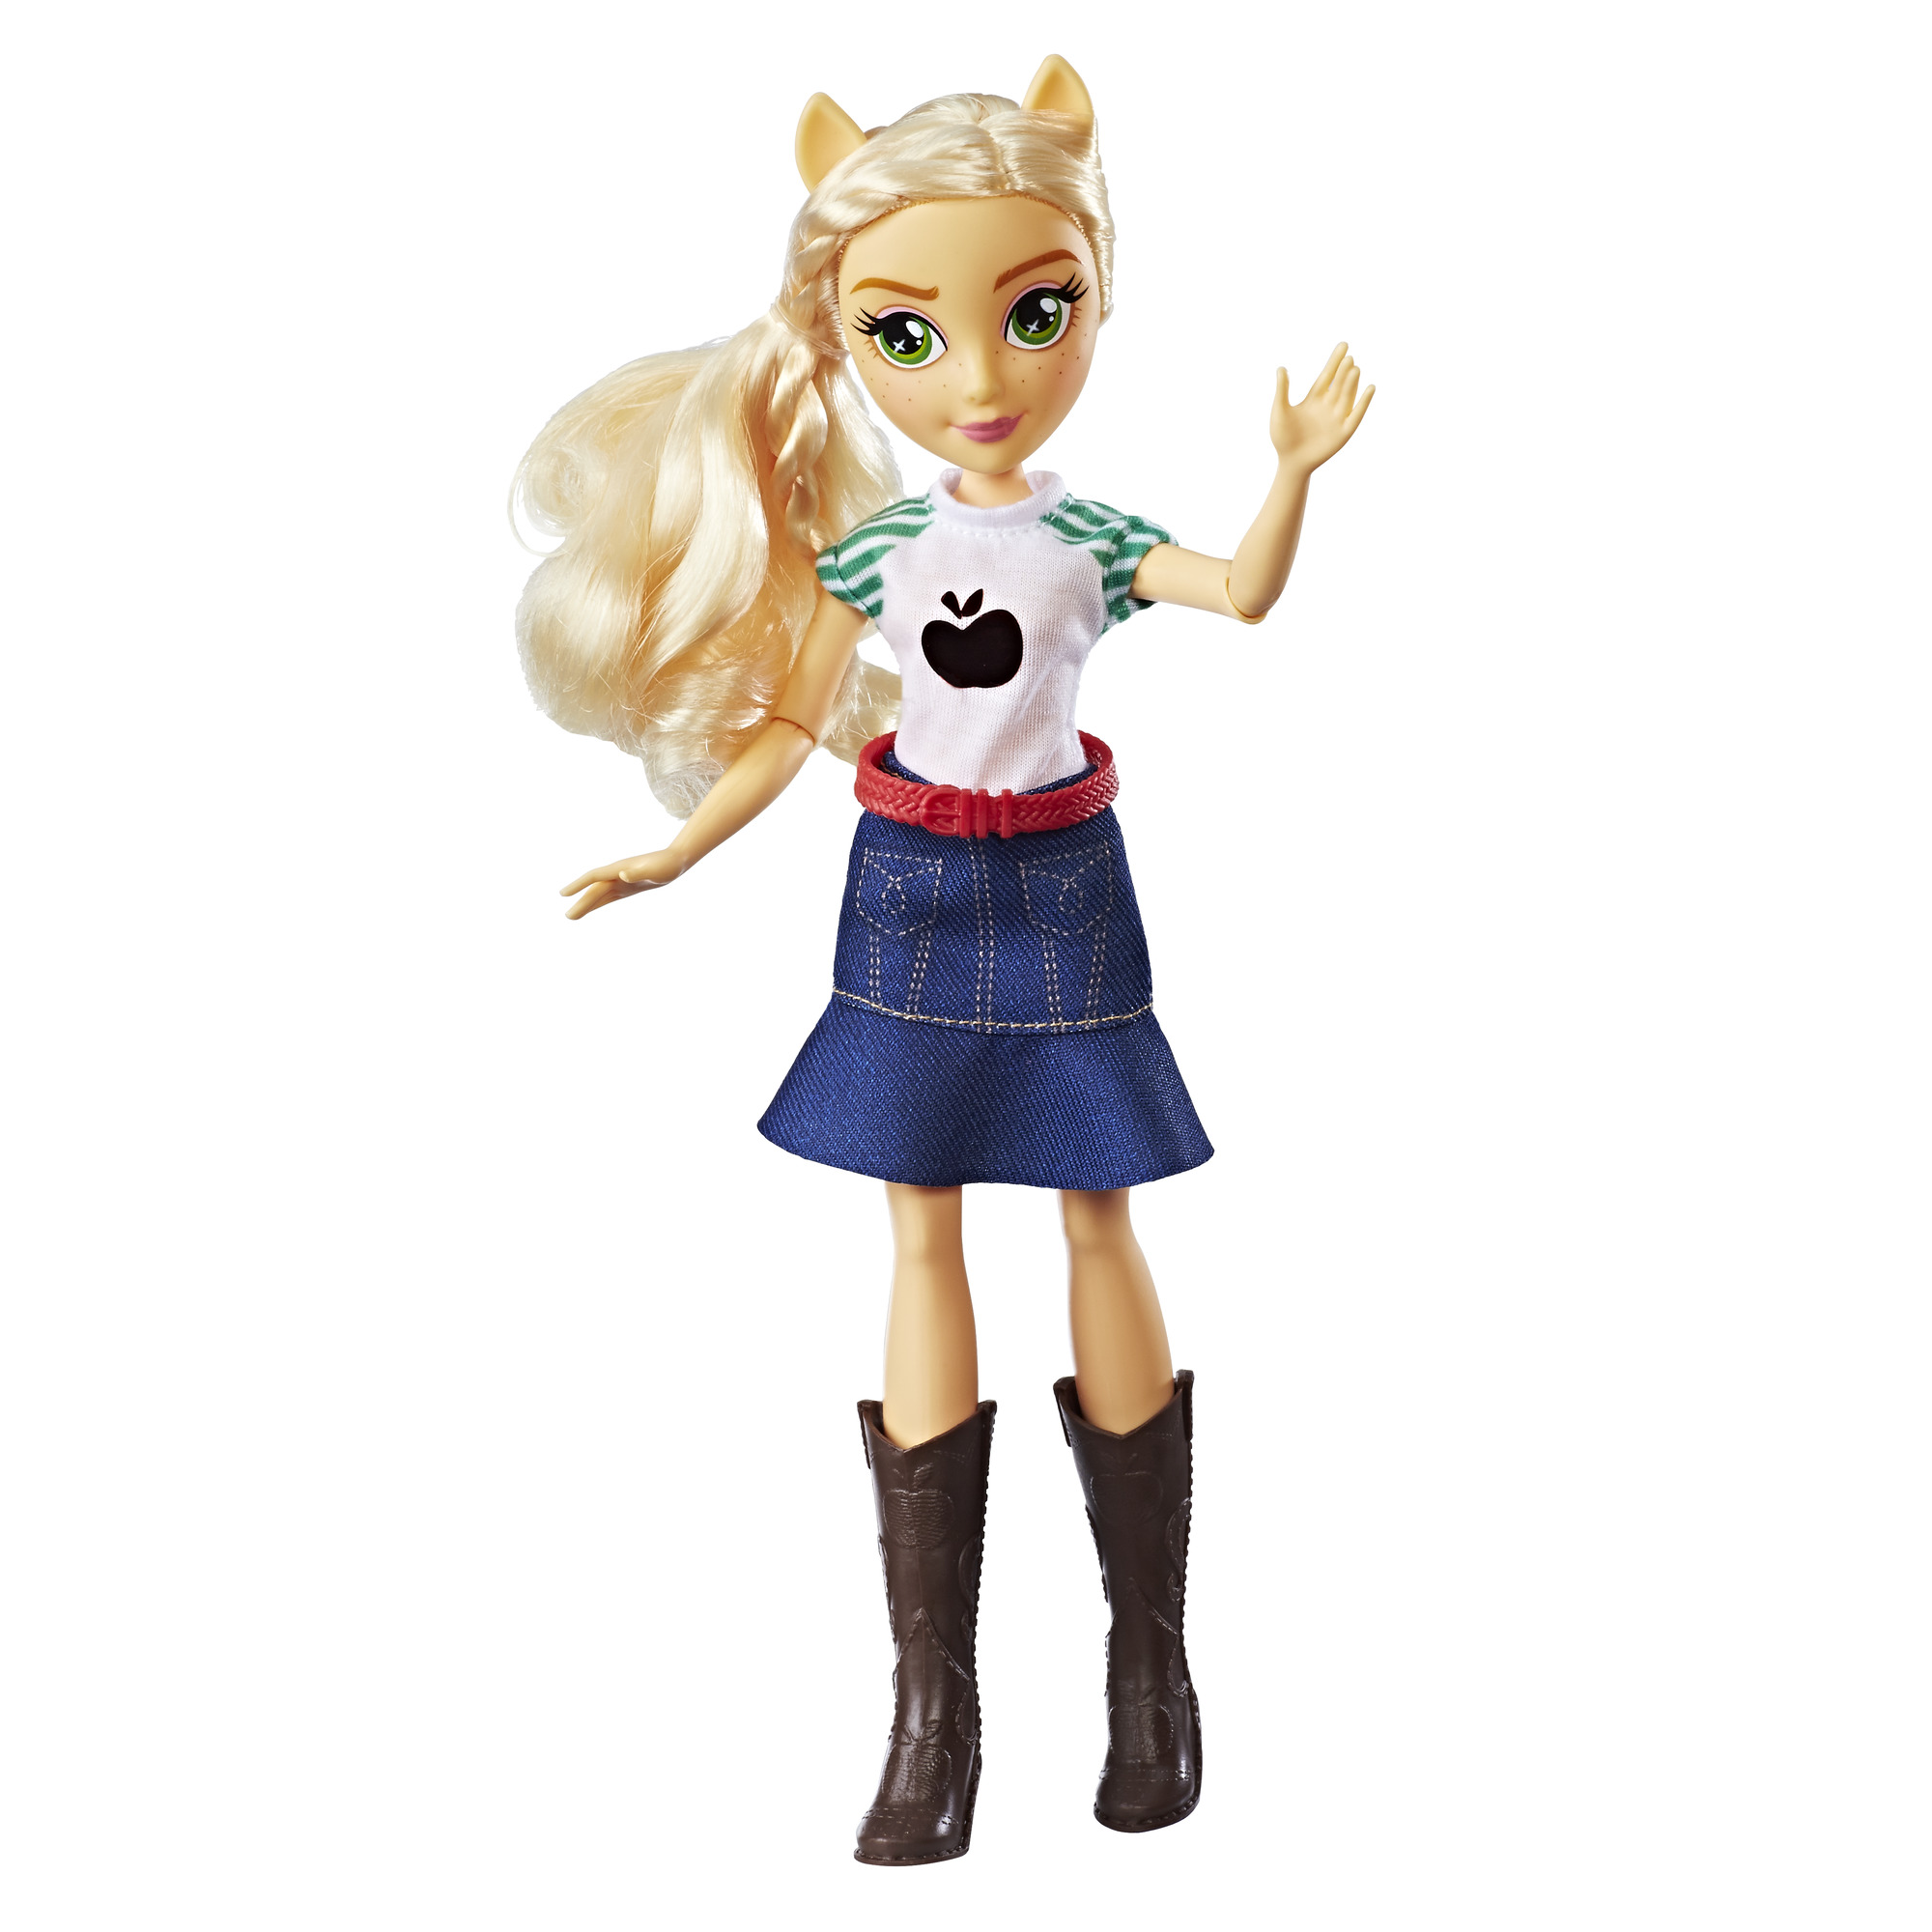 My Little Pony Equestria Girls Applejack Classic Style Doll by Hasbro Inc.